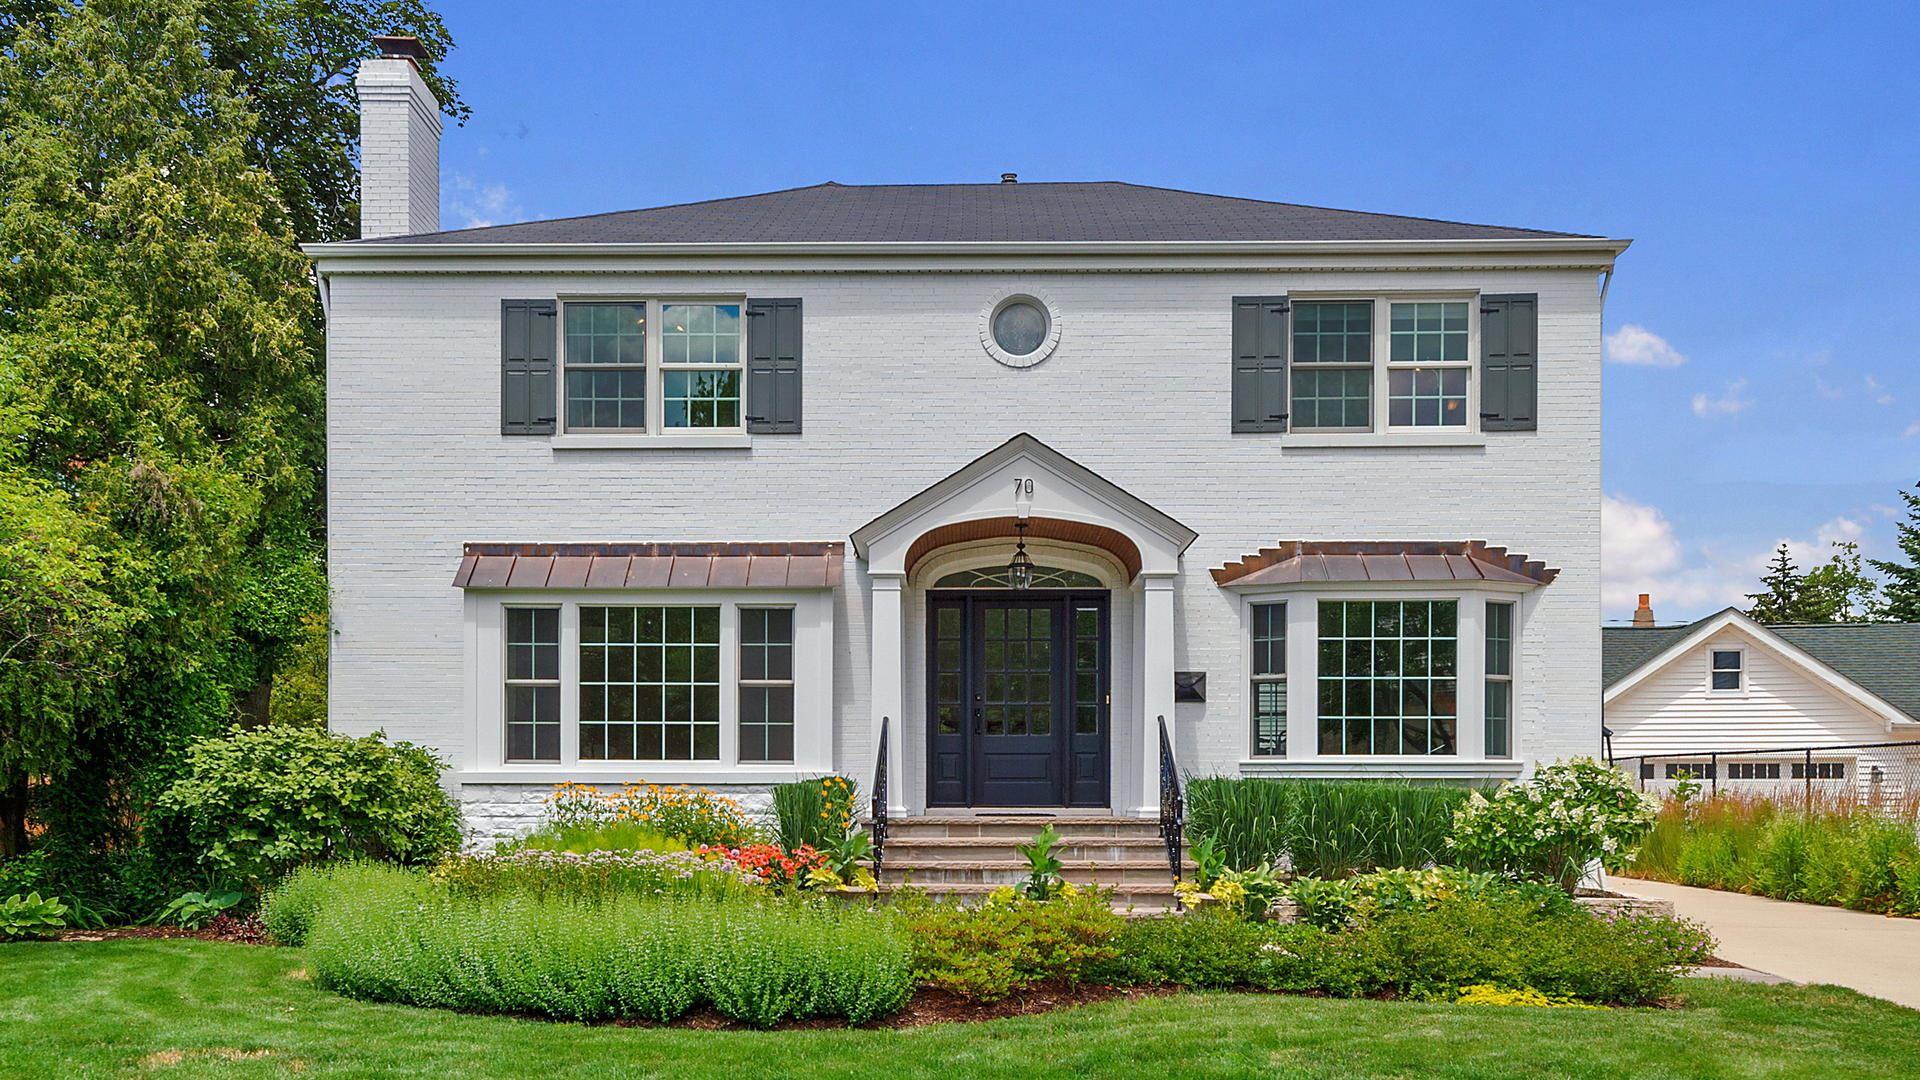 70 Chestnut Avenue, Clarendon Hills, IL 60514 - #: 10747218